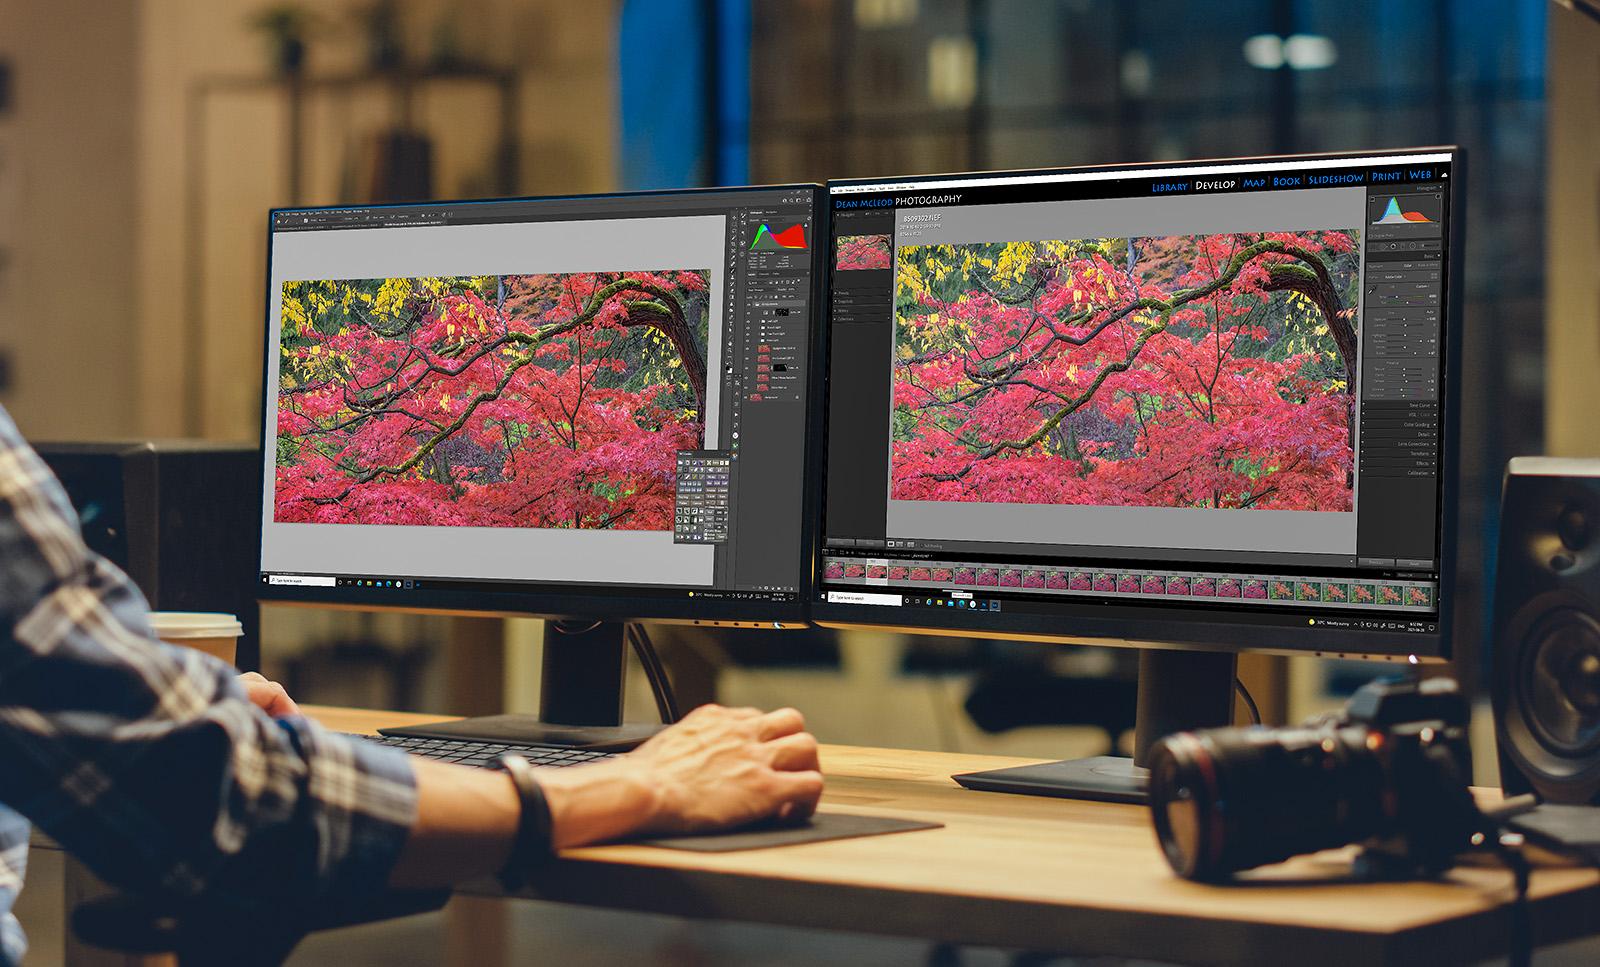 Processing an image using dual monitors and editing software.